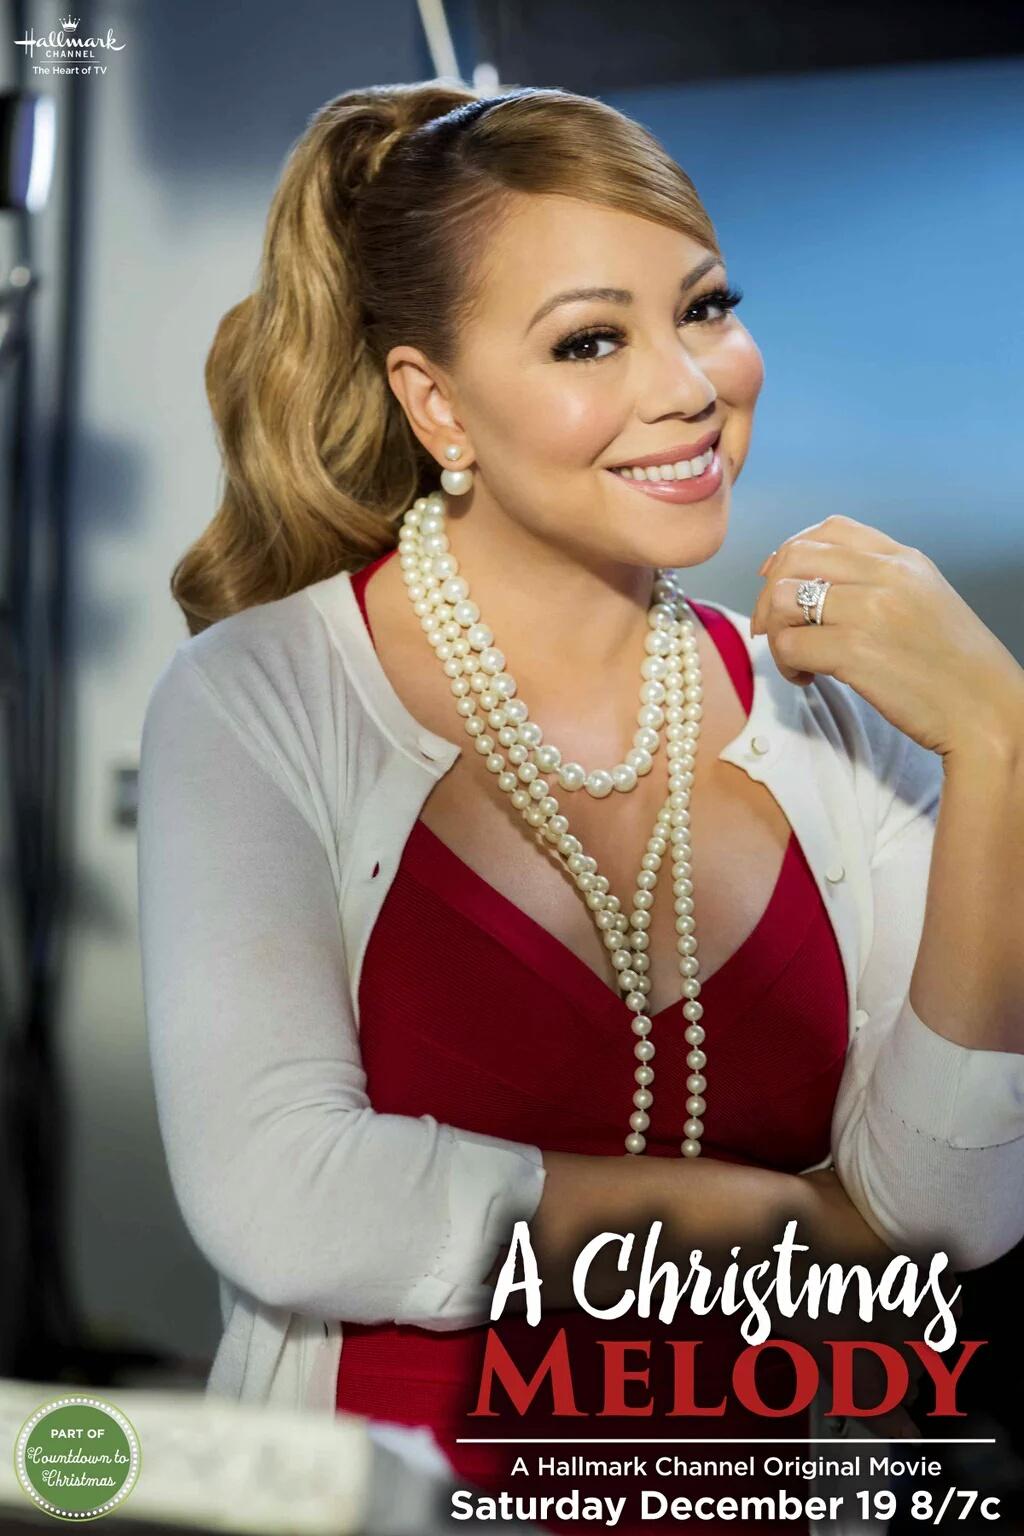 Mariah Carey A Christmas Melody Hallmark Movie Rob Christie Jen Lilley Jingle Bells Tinsel Time